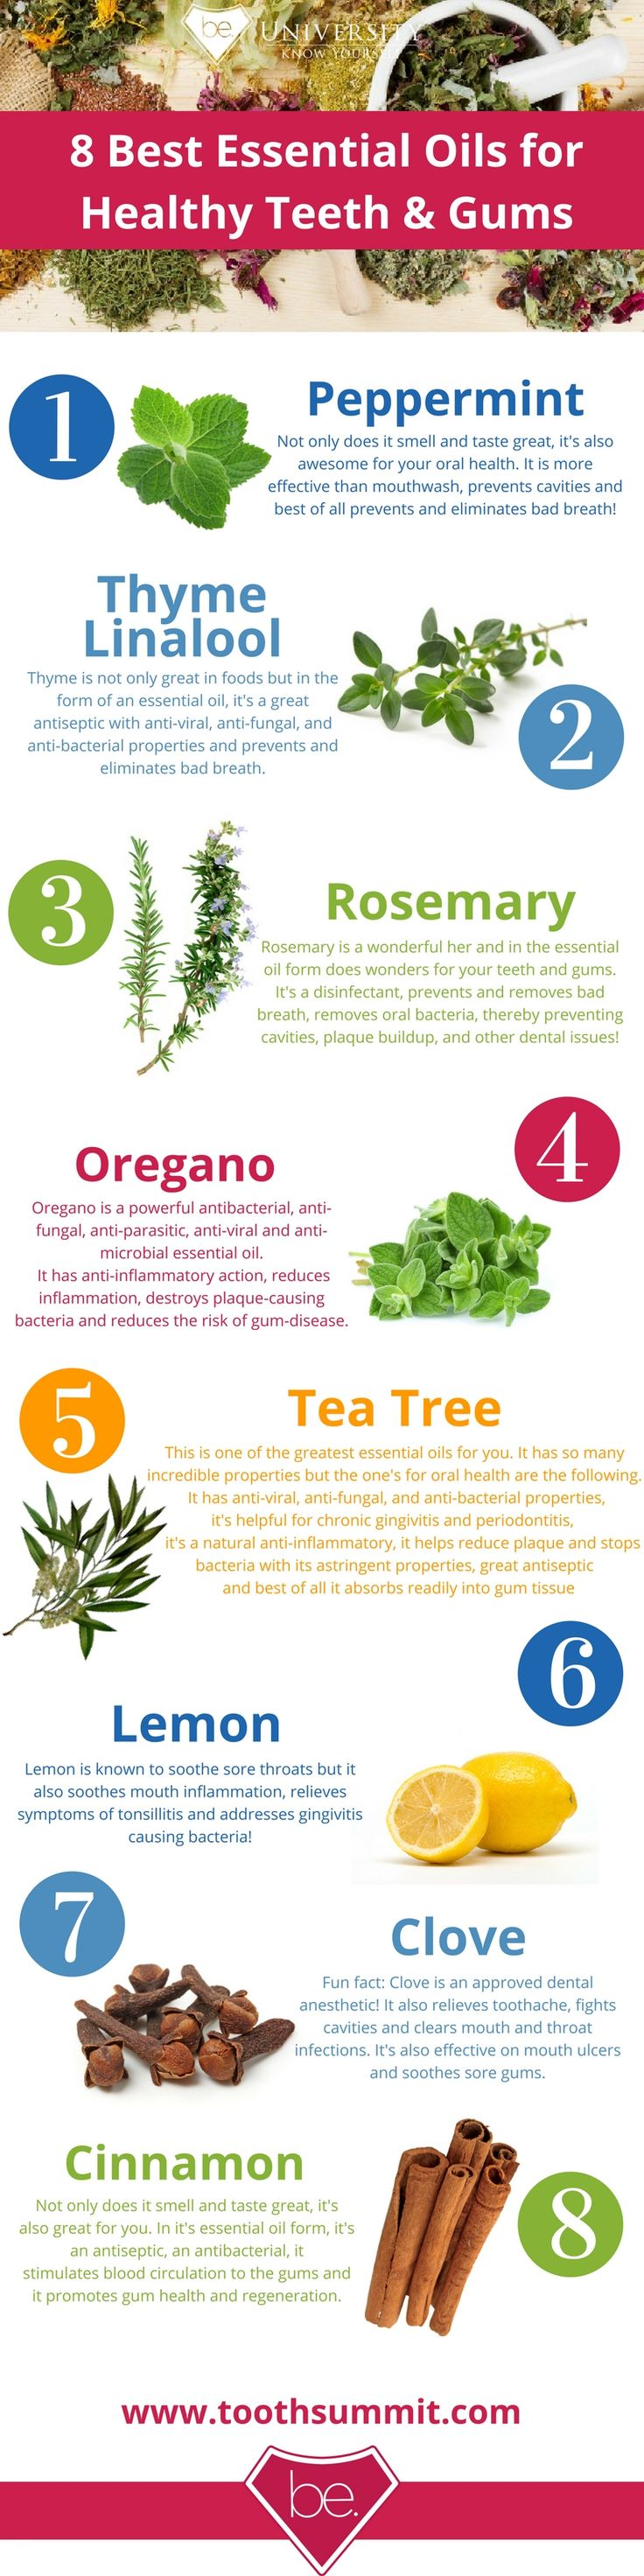 8 Best Essential Oils for Healthy Teeth & Gums  